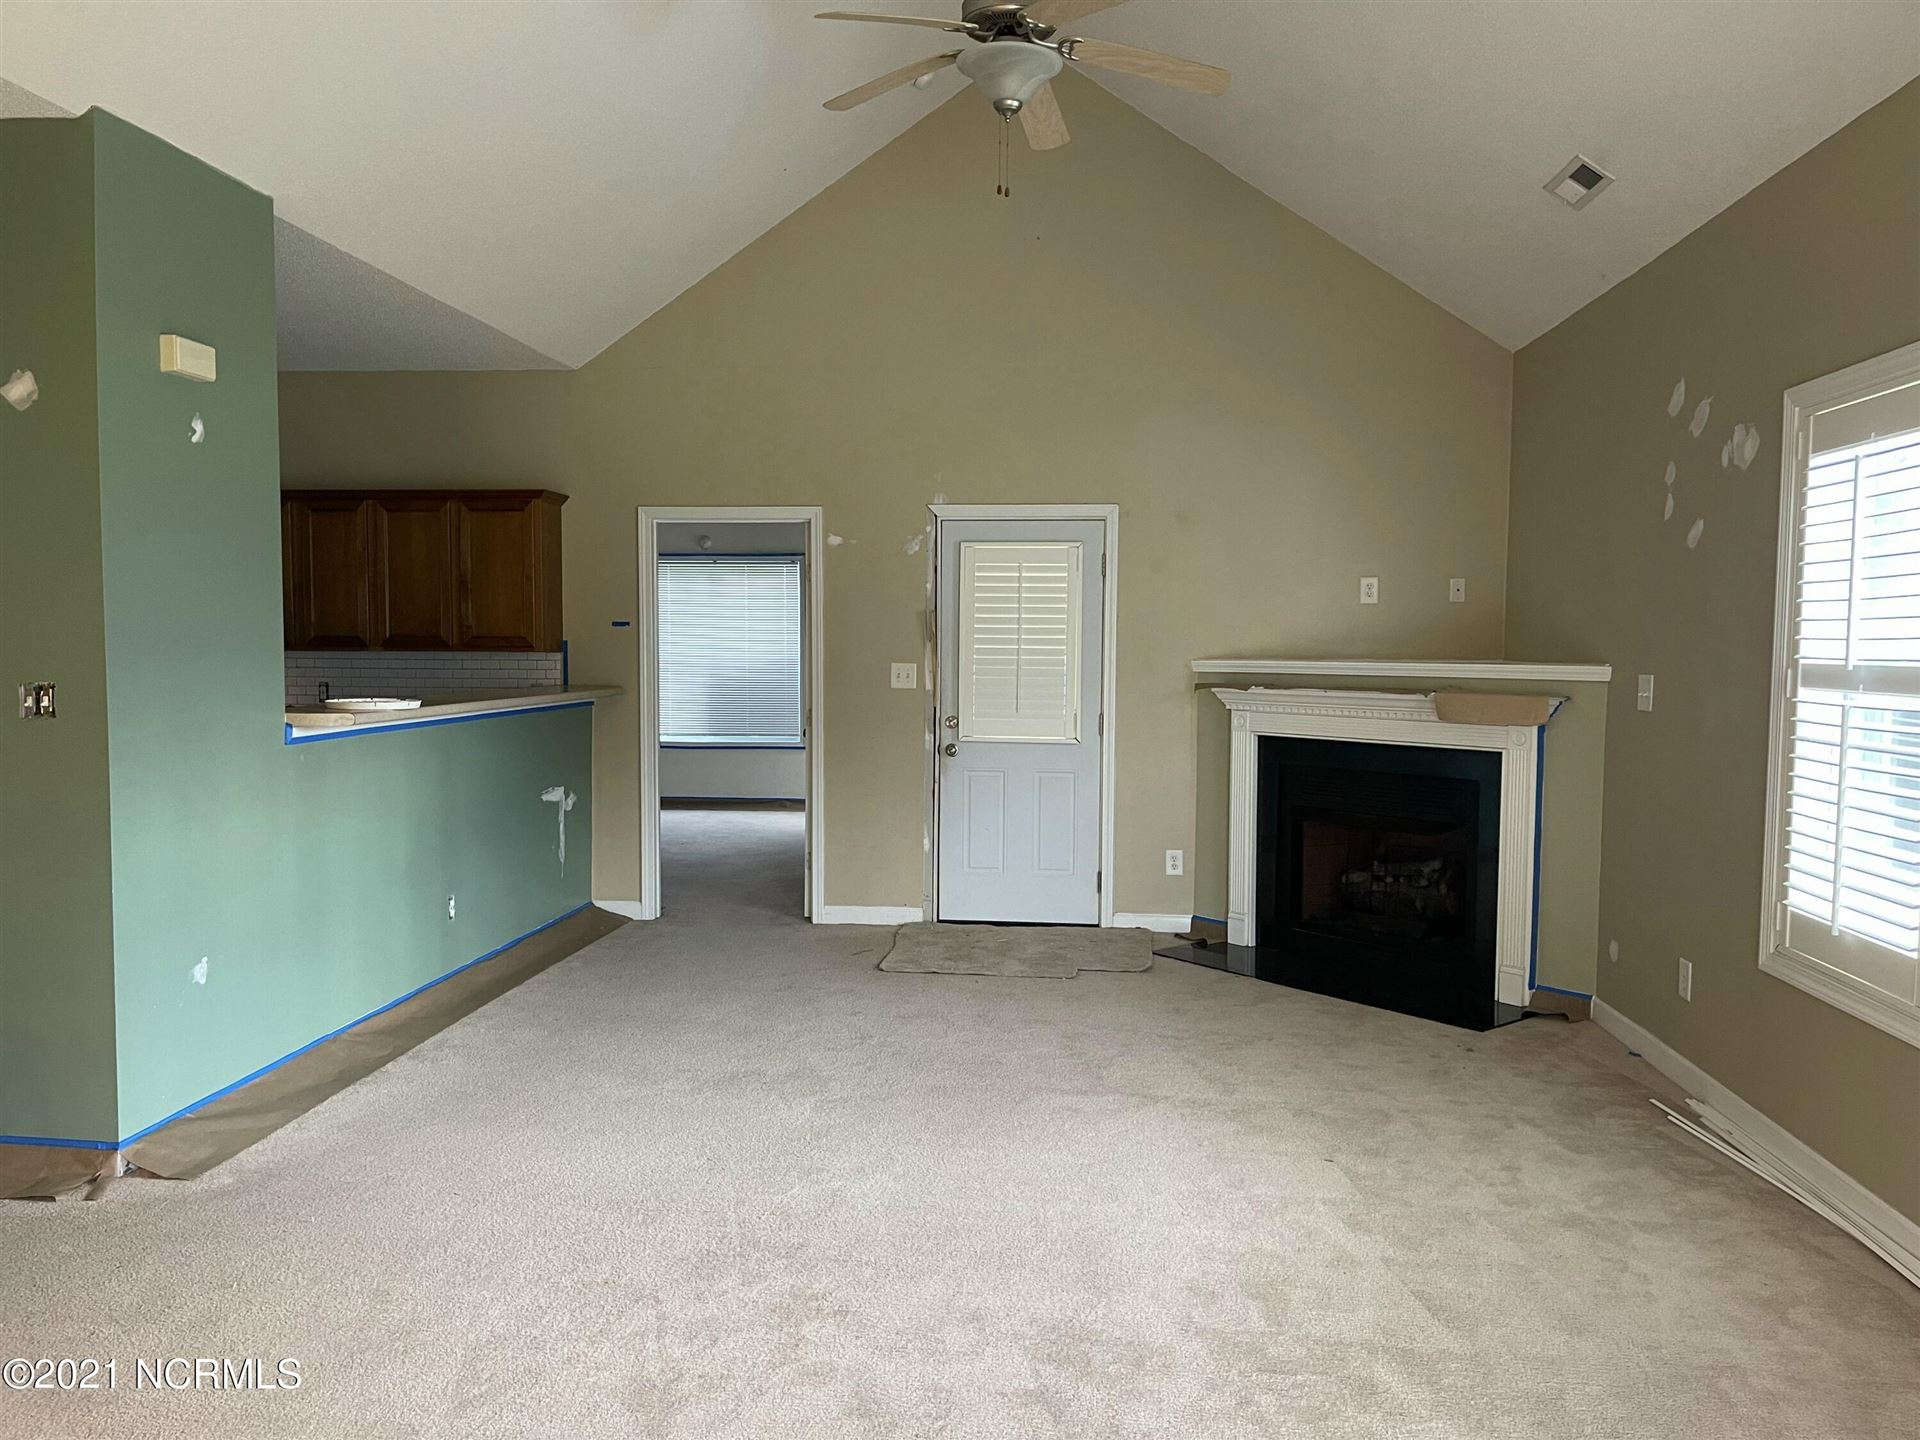 Photo of 124 Whiteleaf Drive, Jacksonville, NC 28546 (MLS # 100287850)